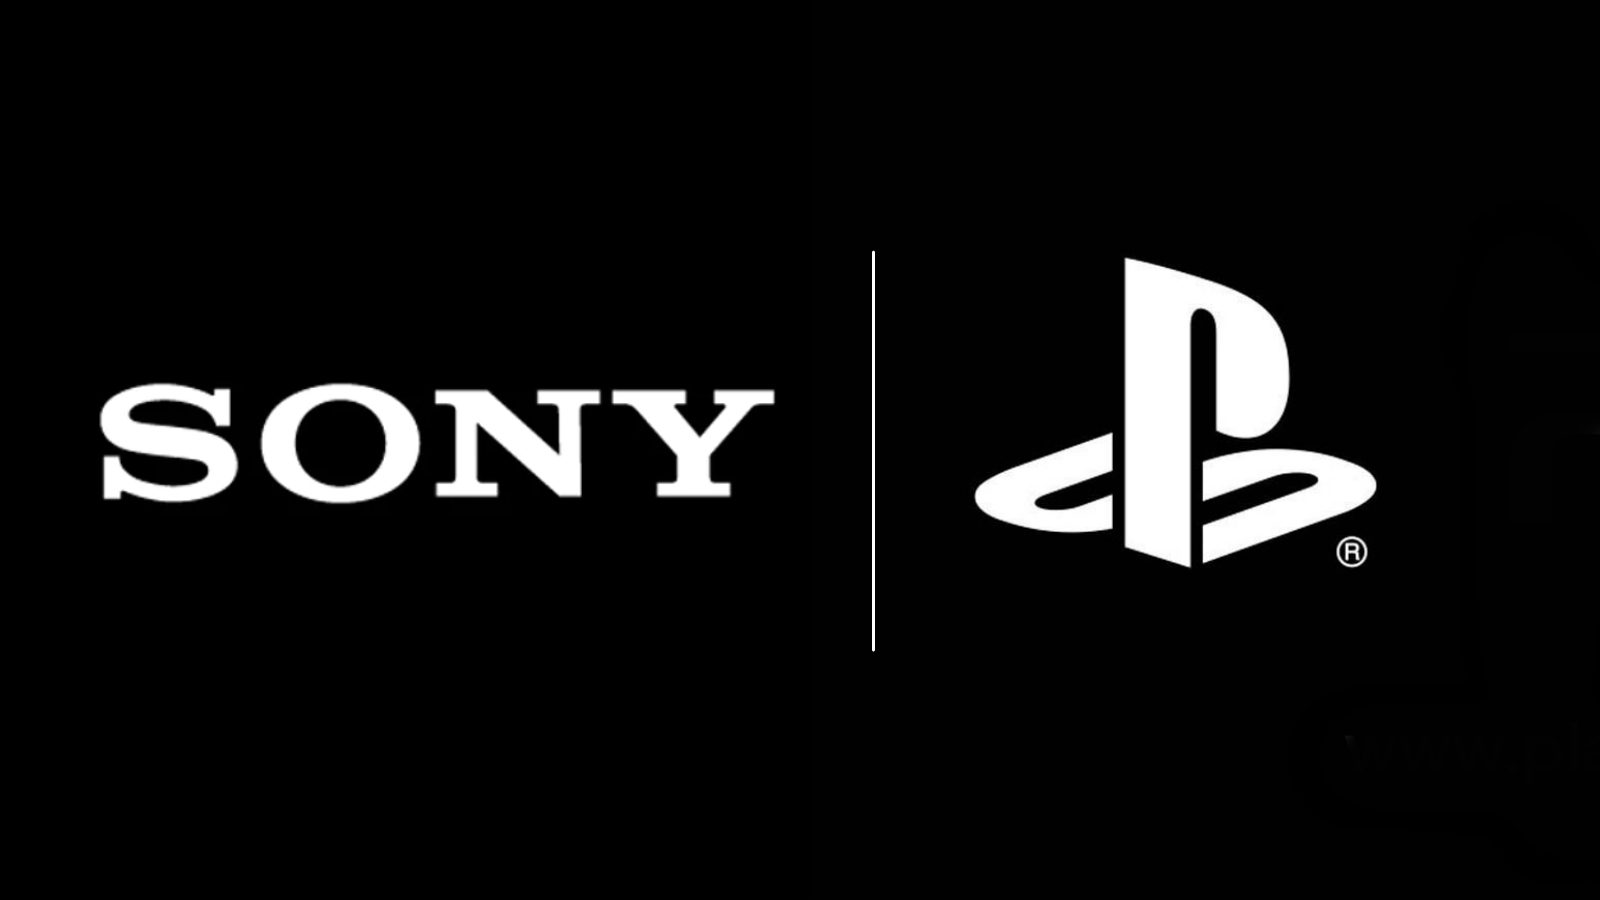 Sony Playstation PS4 PS5